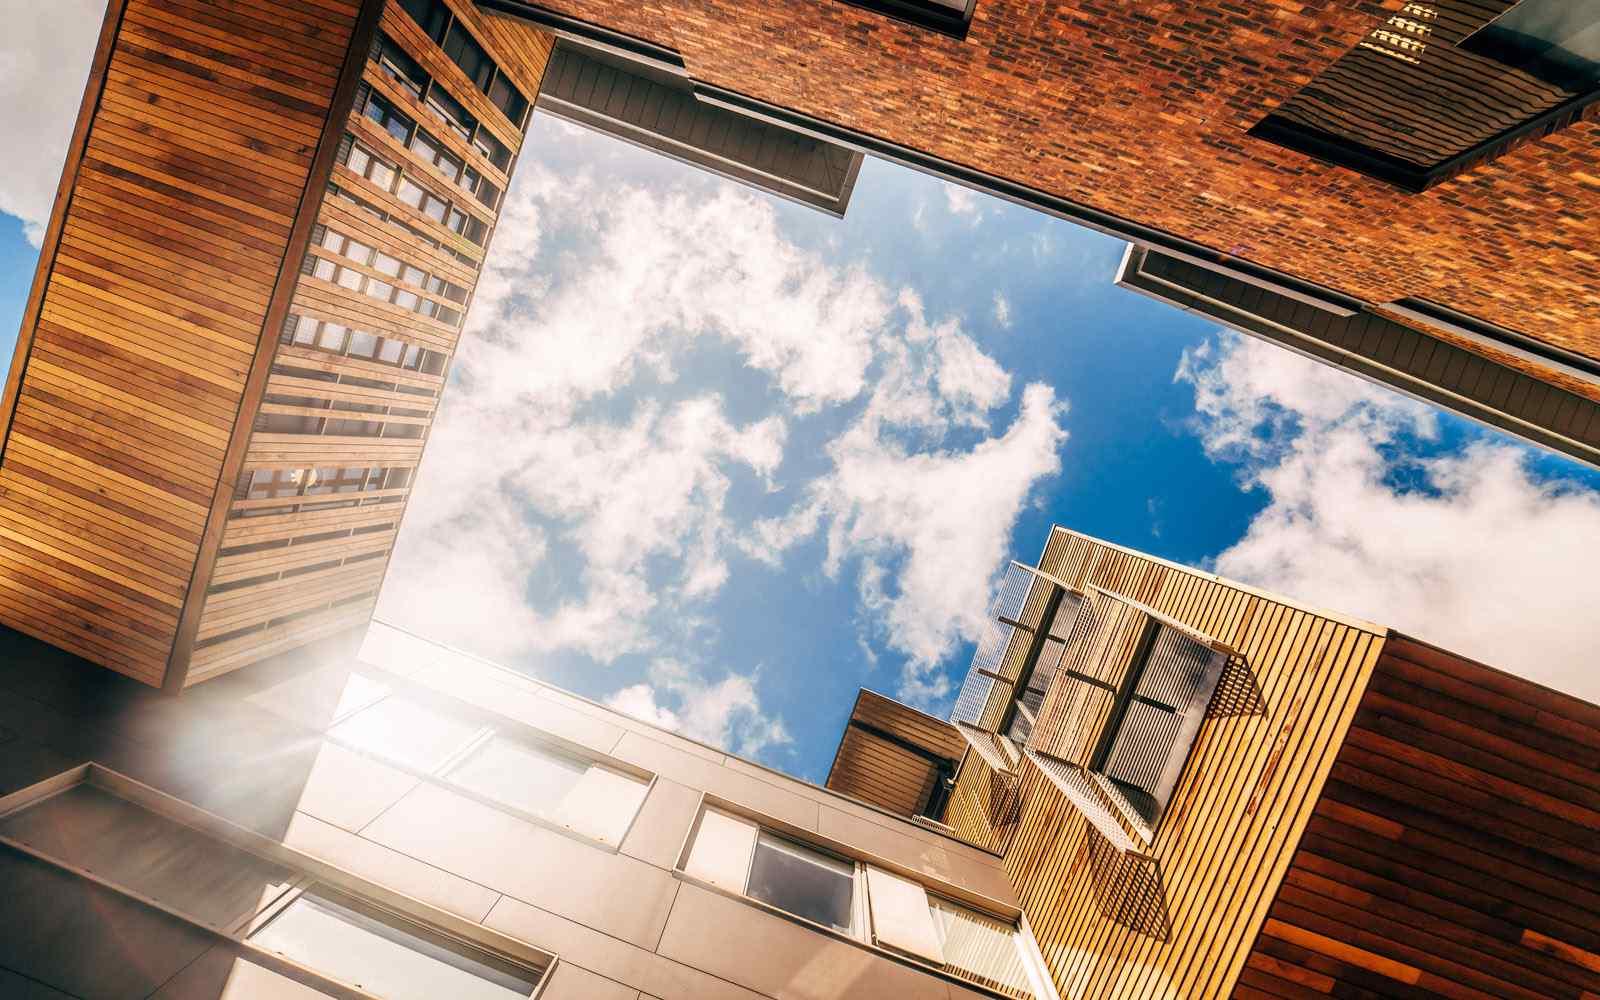 Looking up between campus buildings to see blue sky.